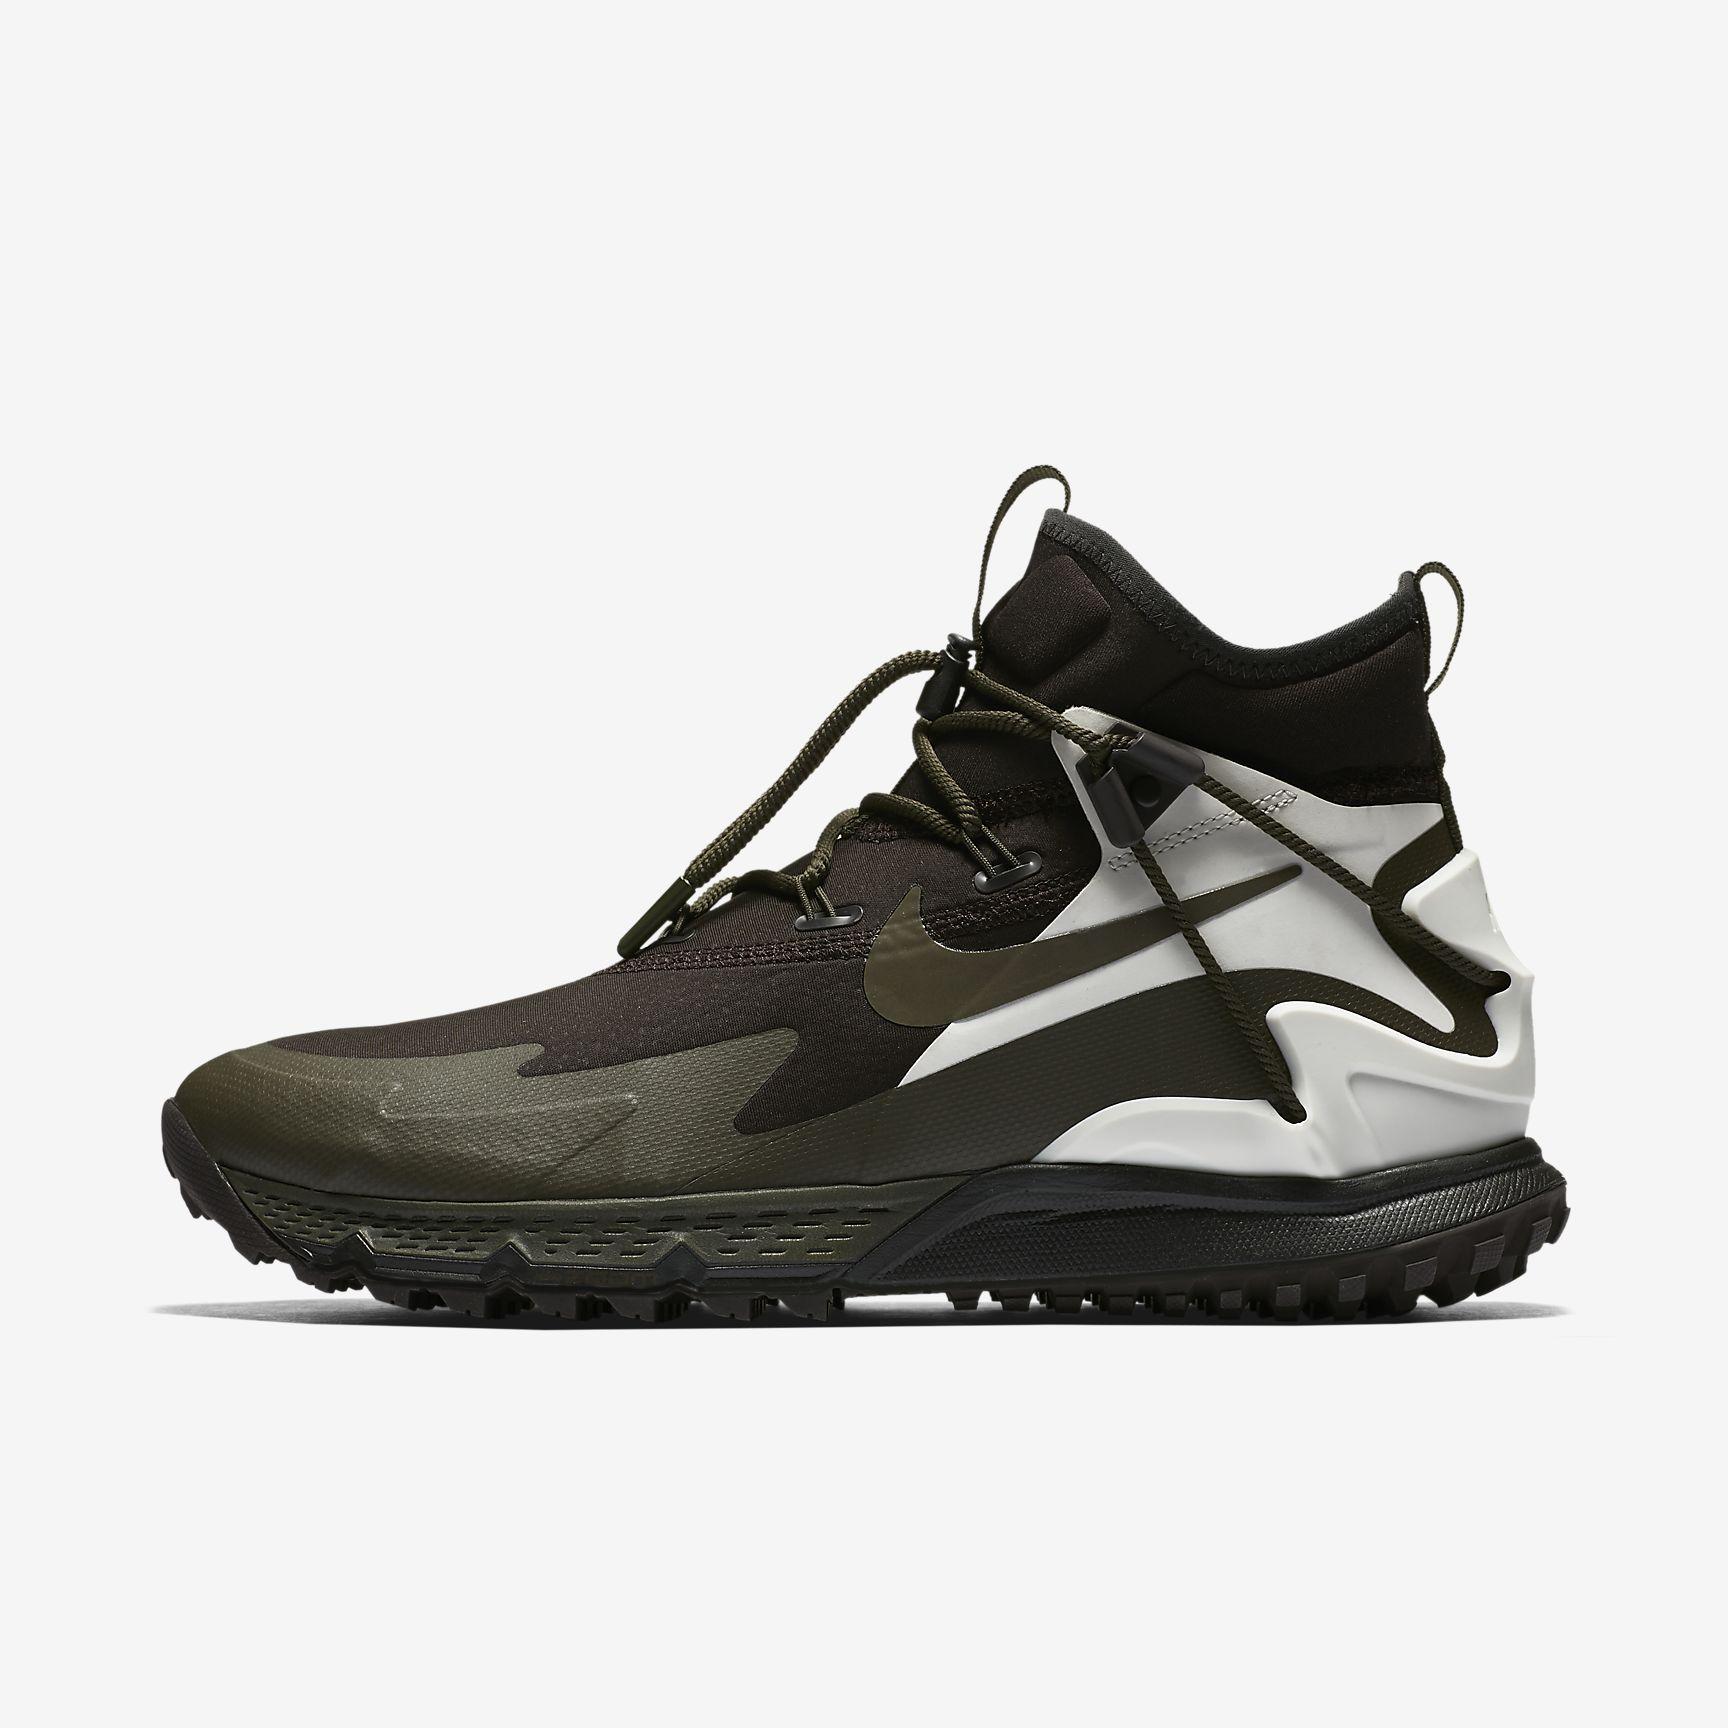 Nike Terra Sertig Men's Boot | collection 2019 all new